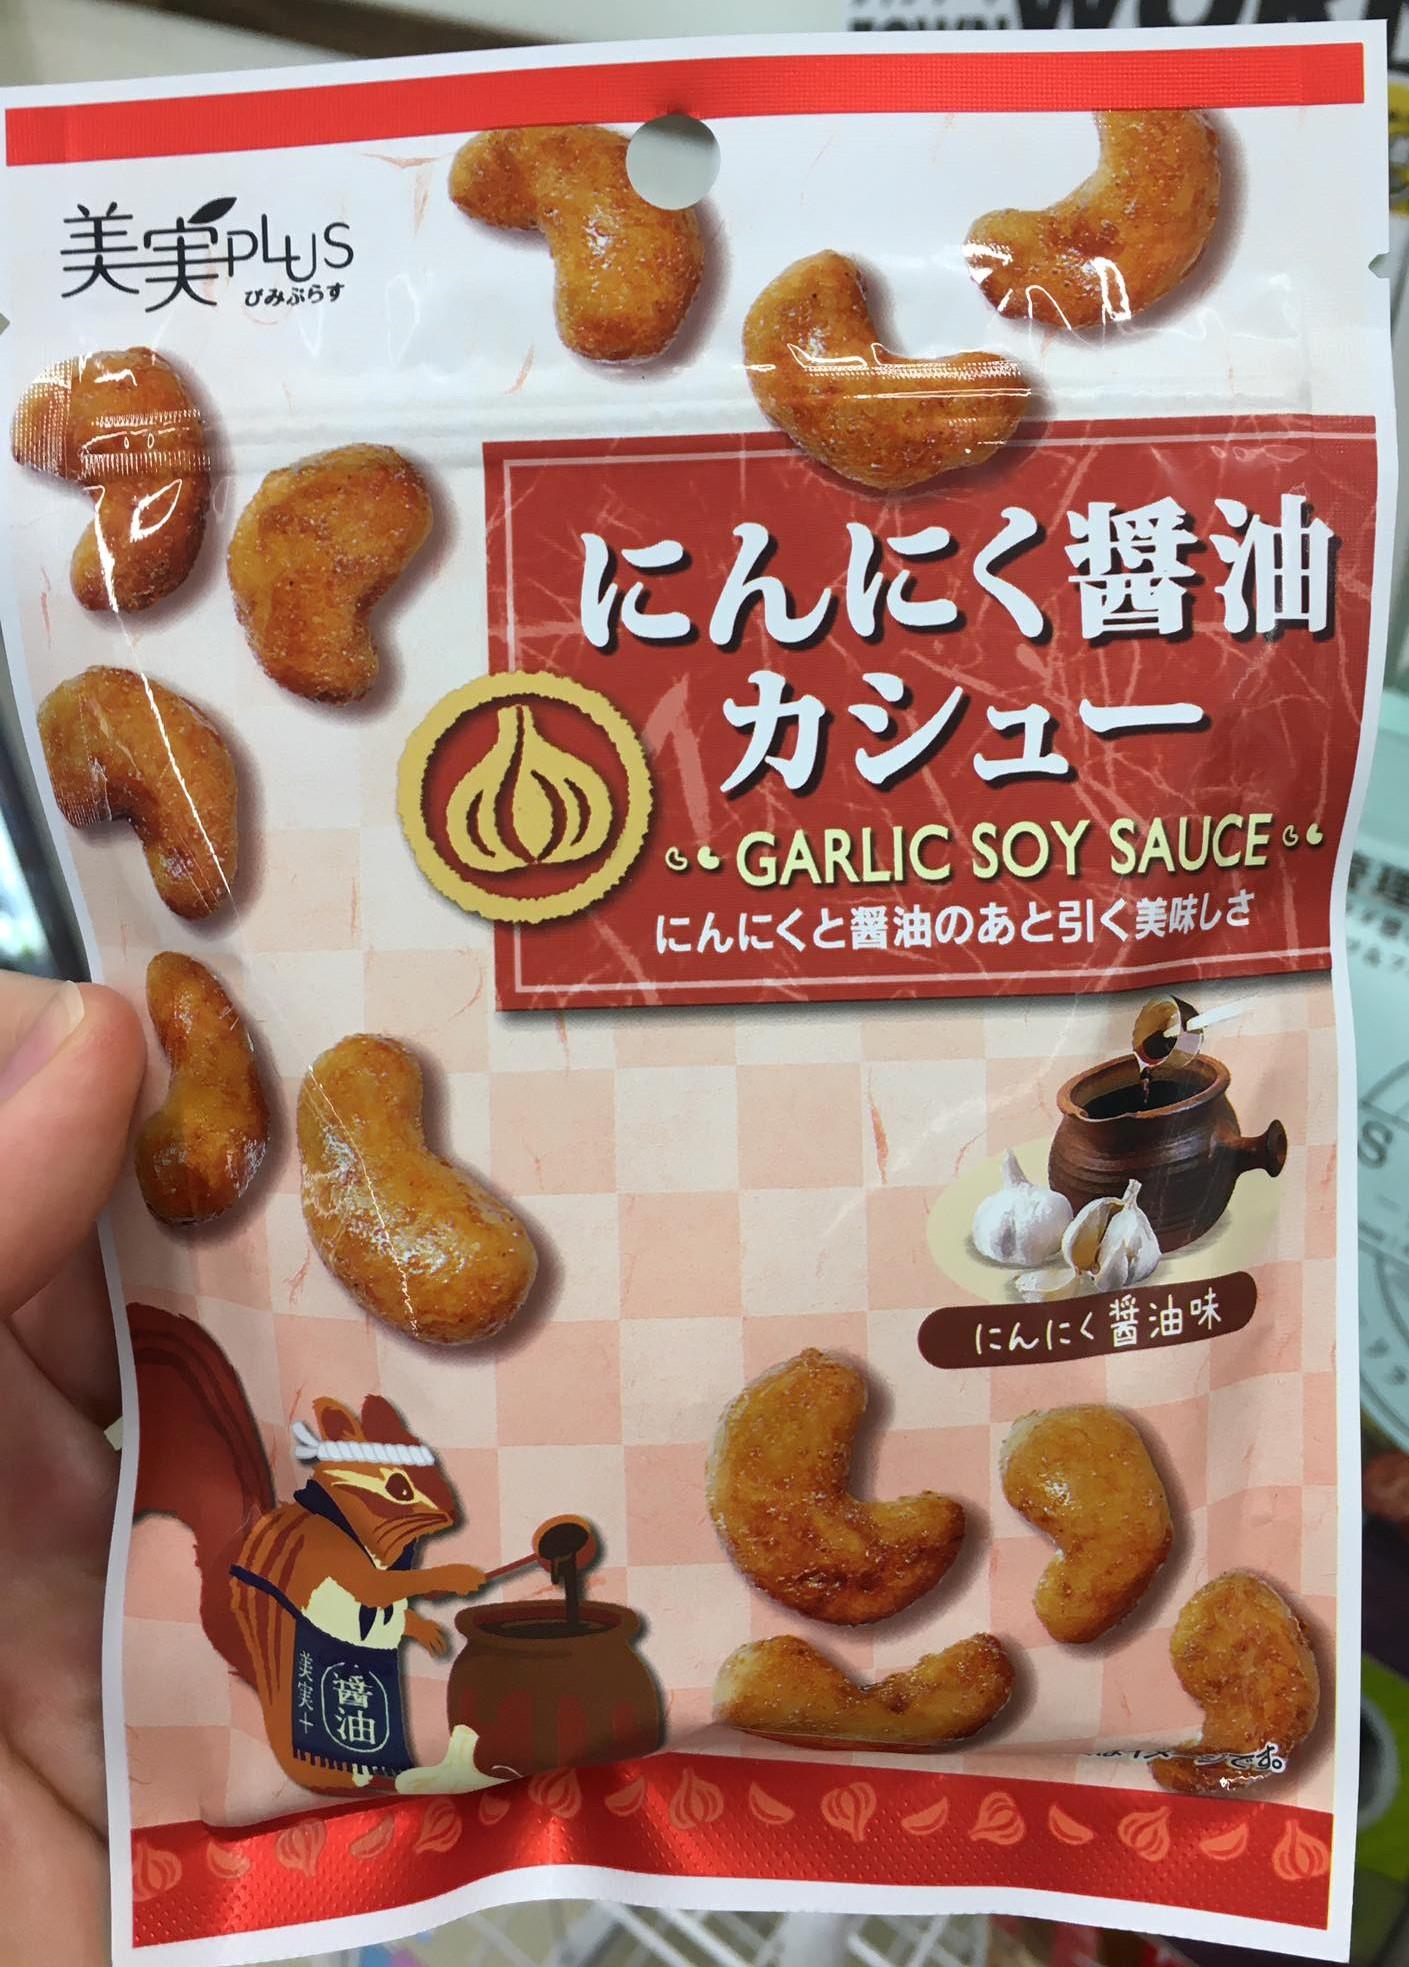 Bimi Plus Garlic Soy Sauce Cashew